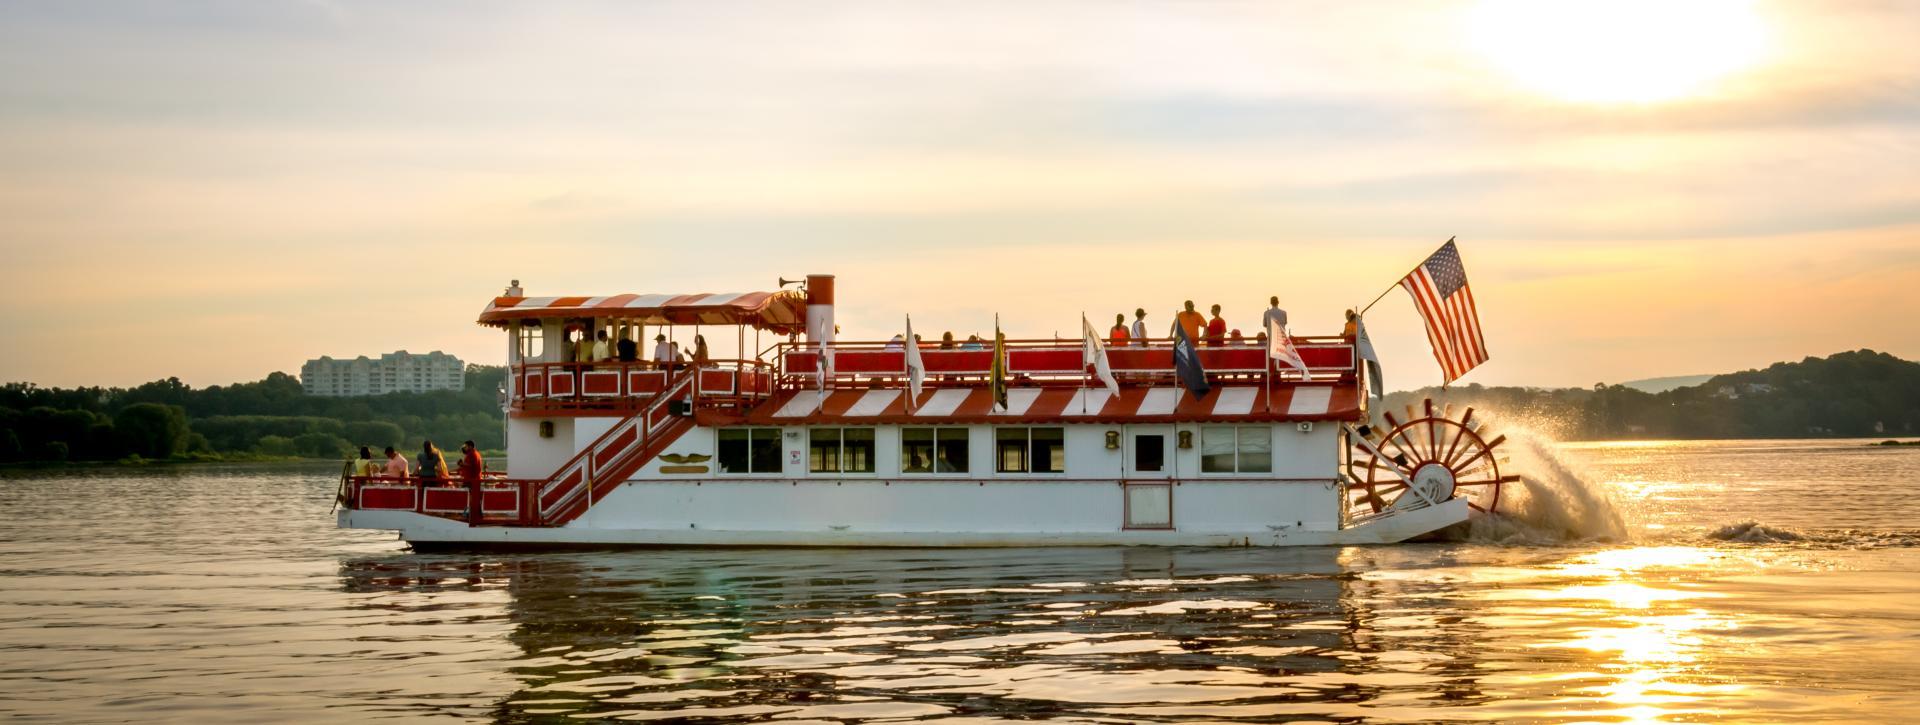 pride-of-the-susquehanna-riverboat-harrisburg-city-island